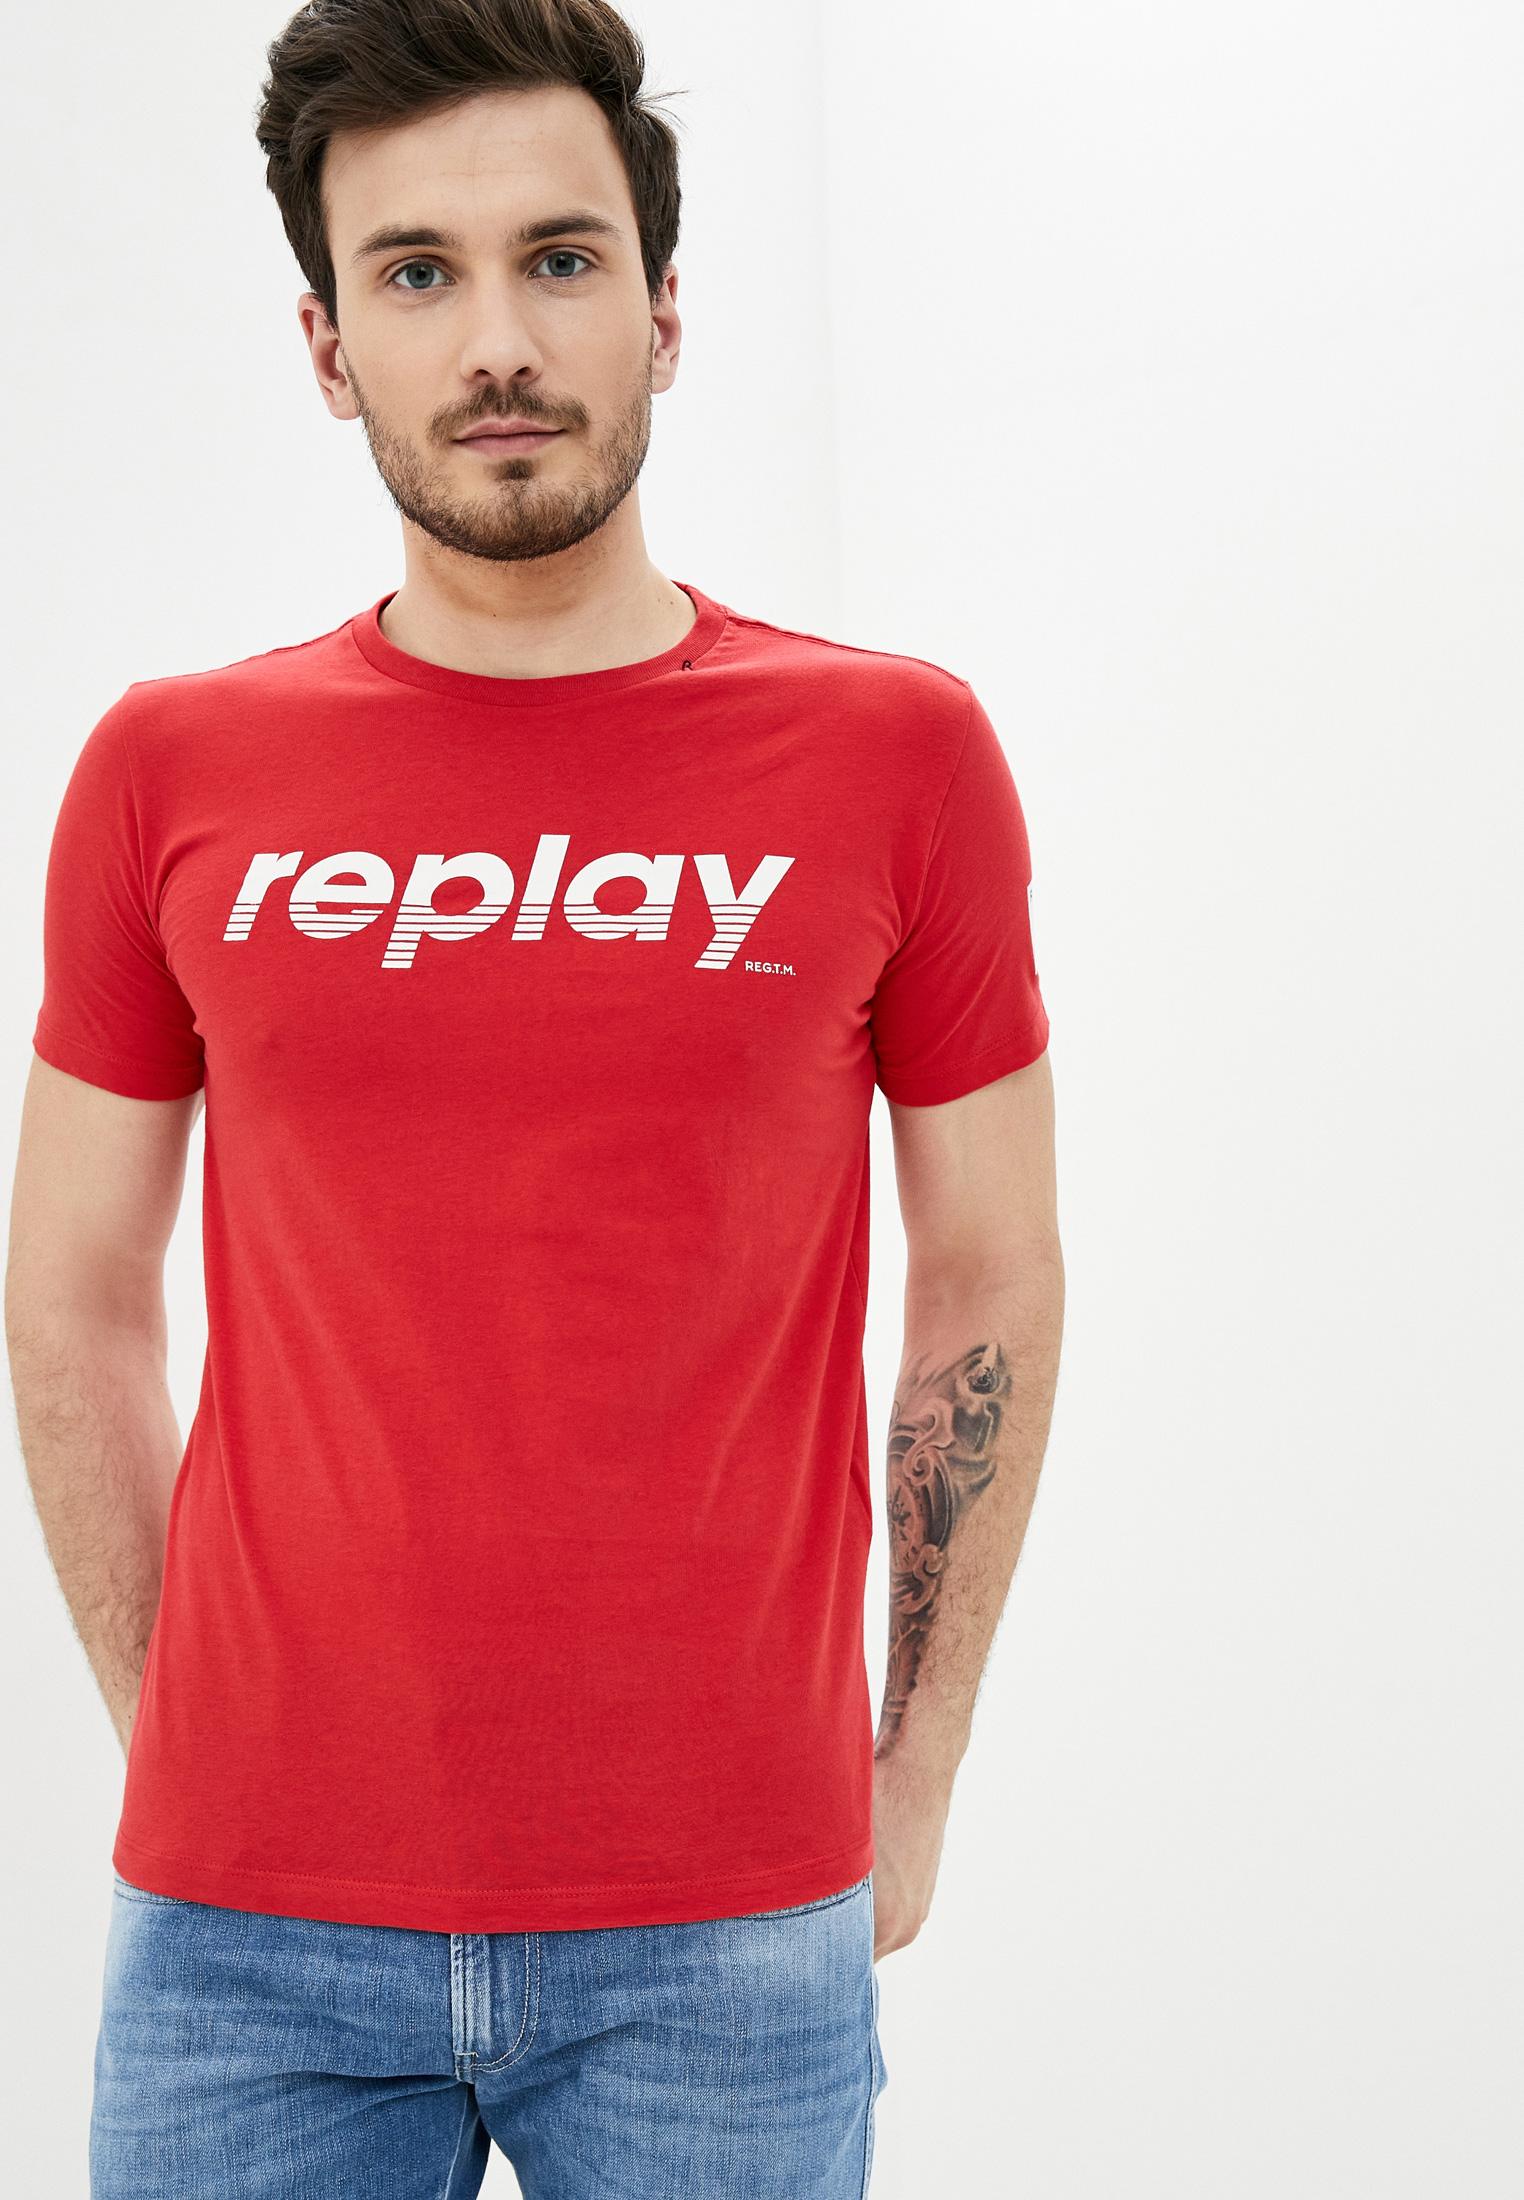 Футболка Replay купить за 1 340 ₽ в интернет-магазине Lamoda.ru